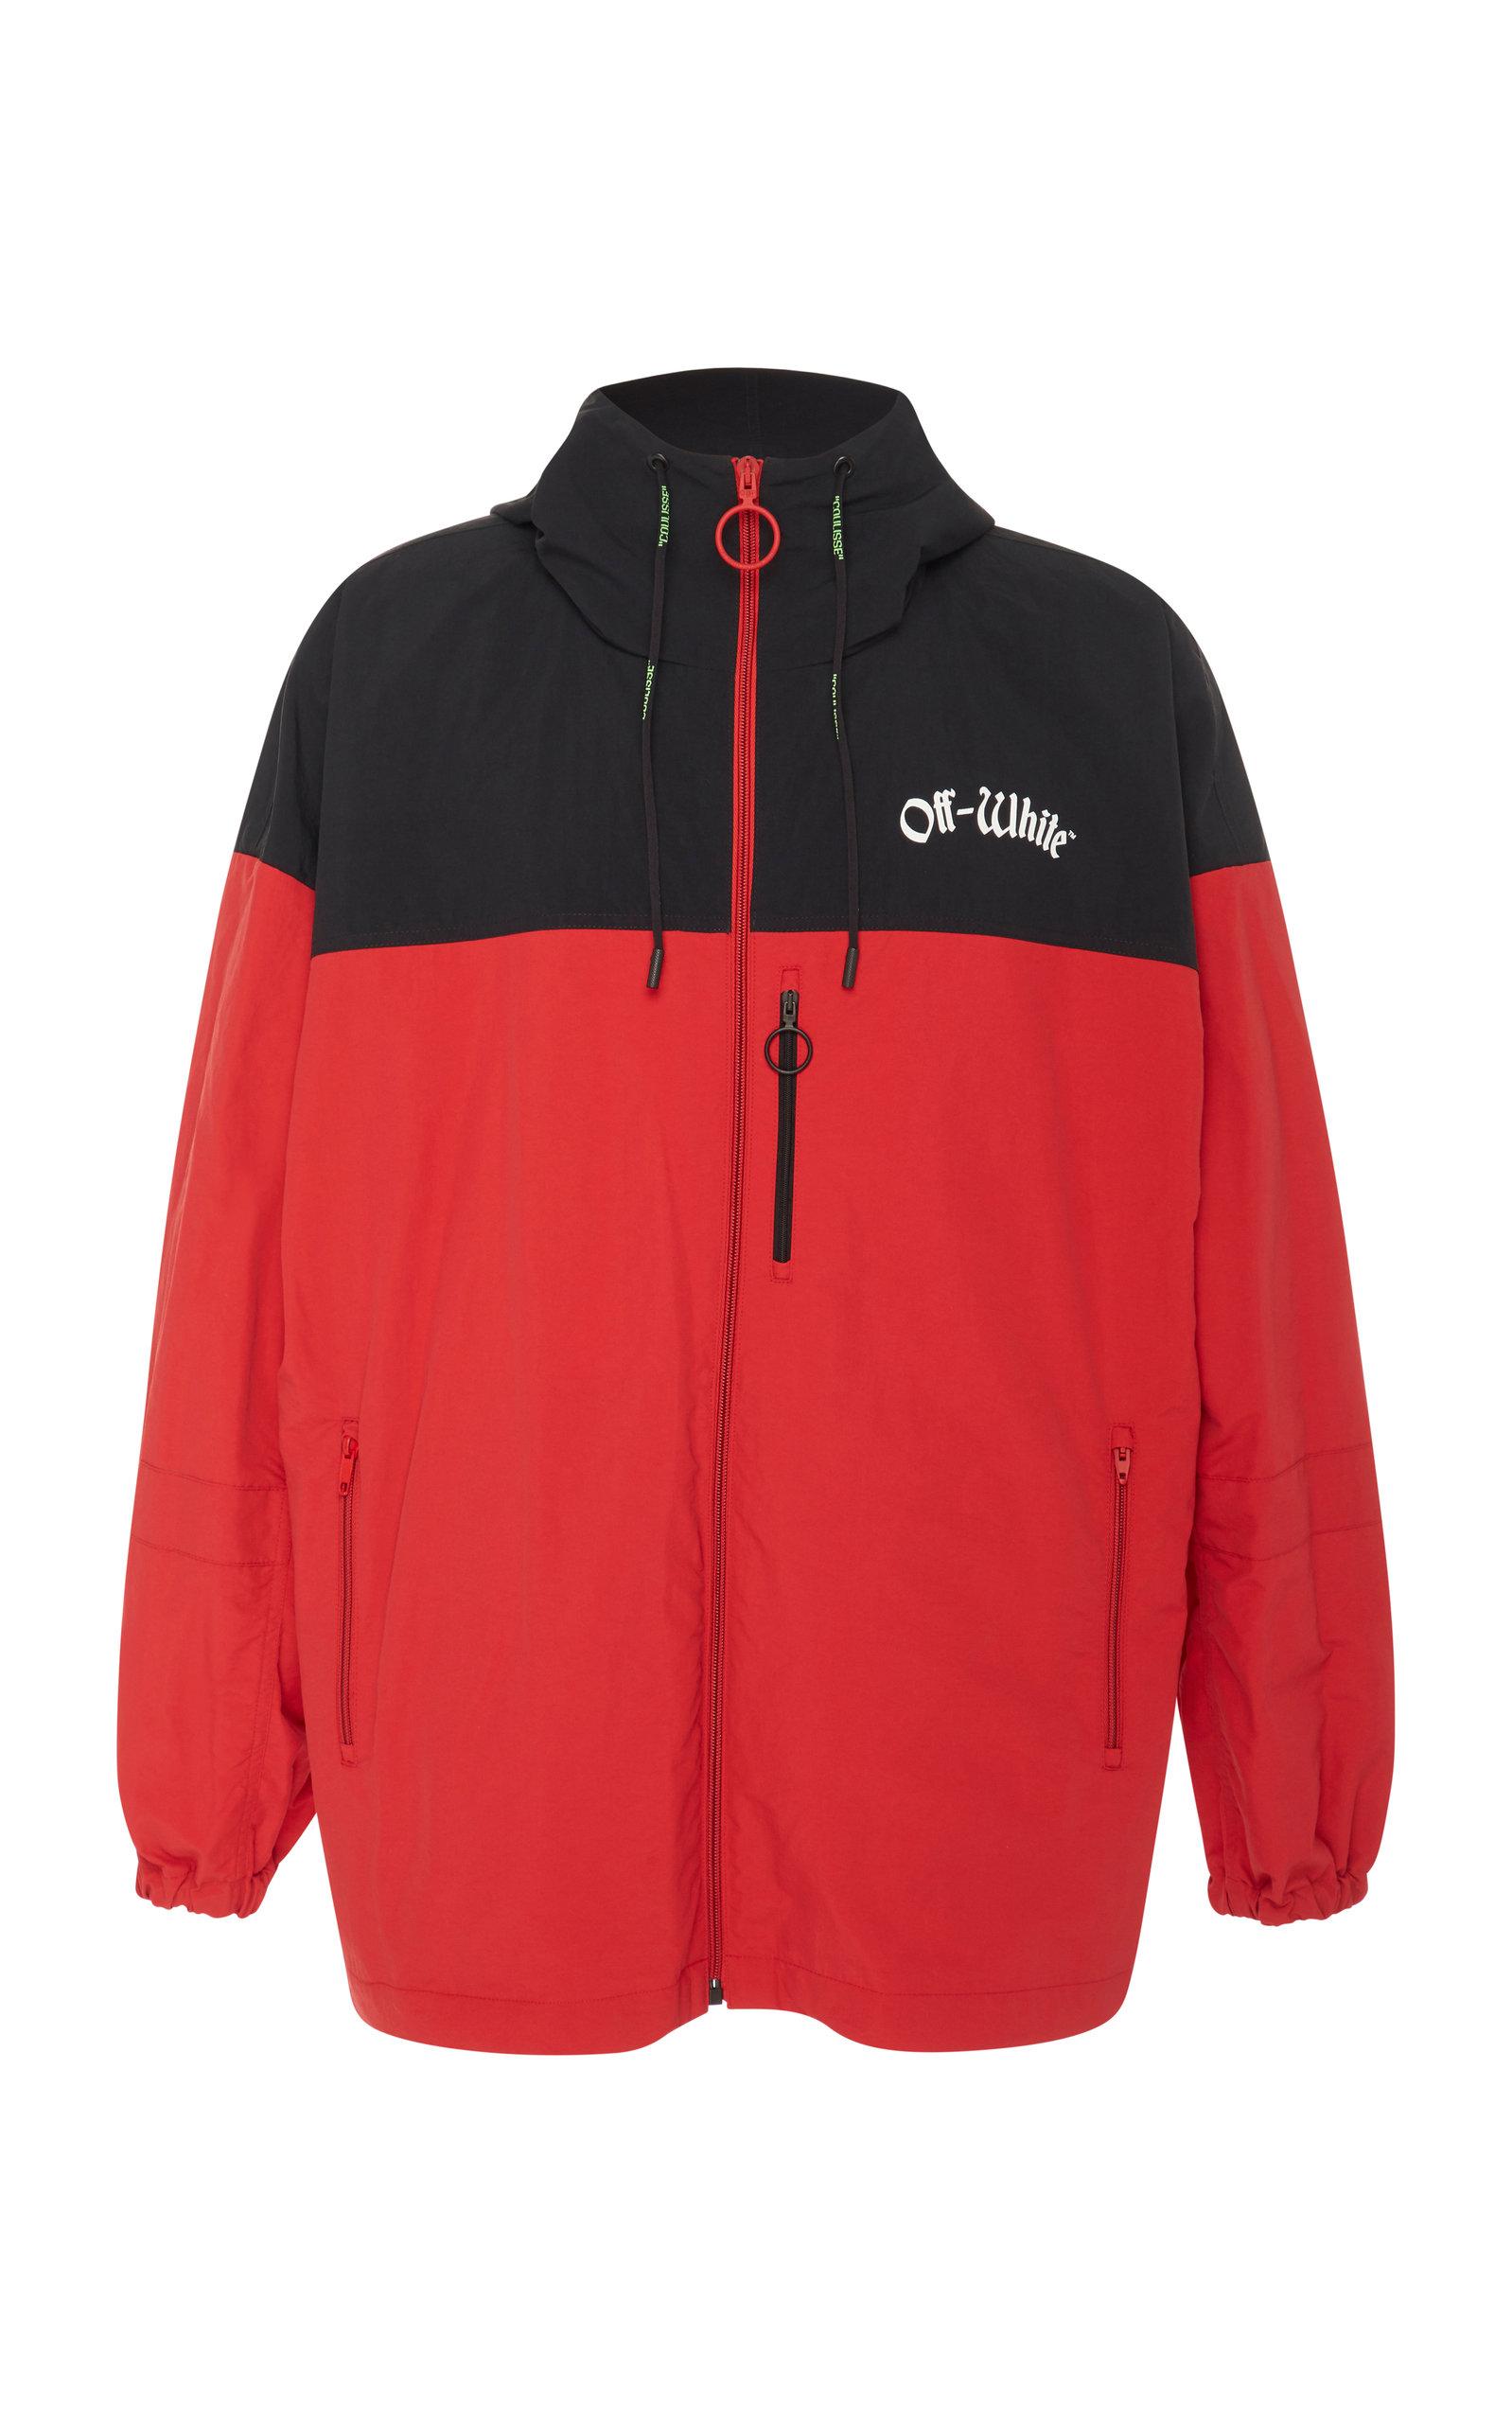 Off-white Men's Full-zip Wind-resistant Jacket In Red